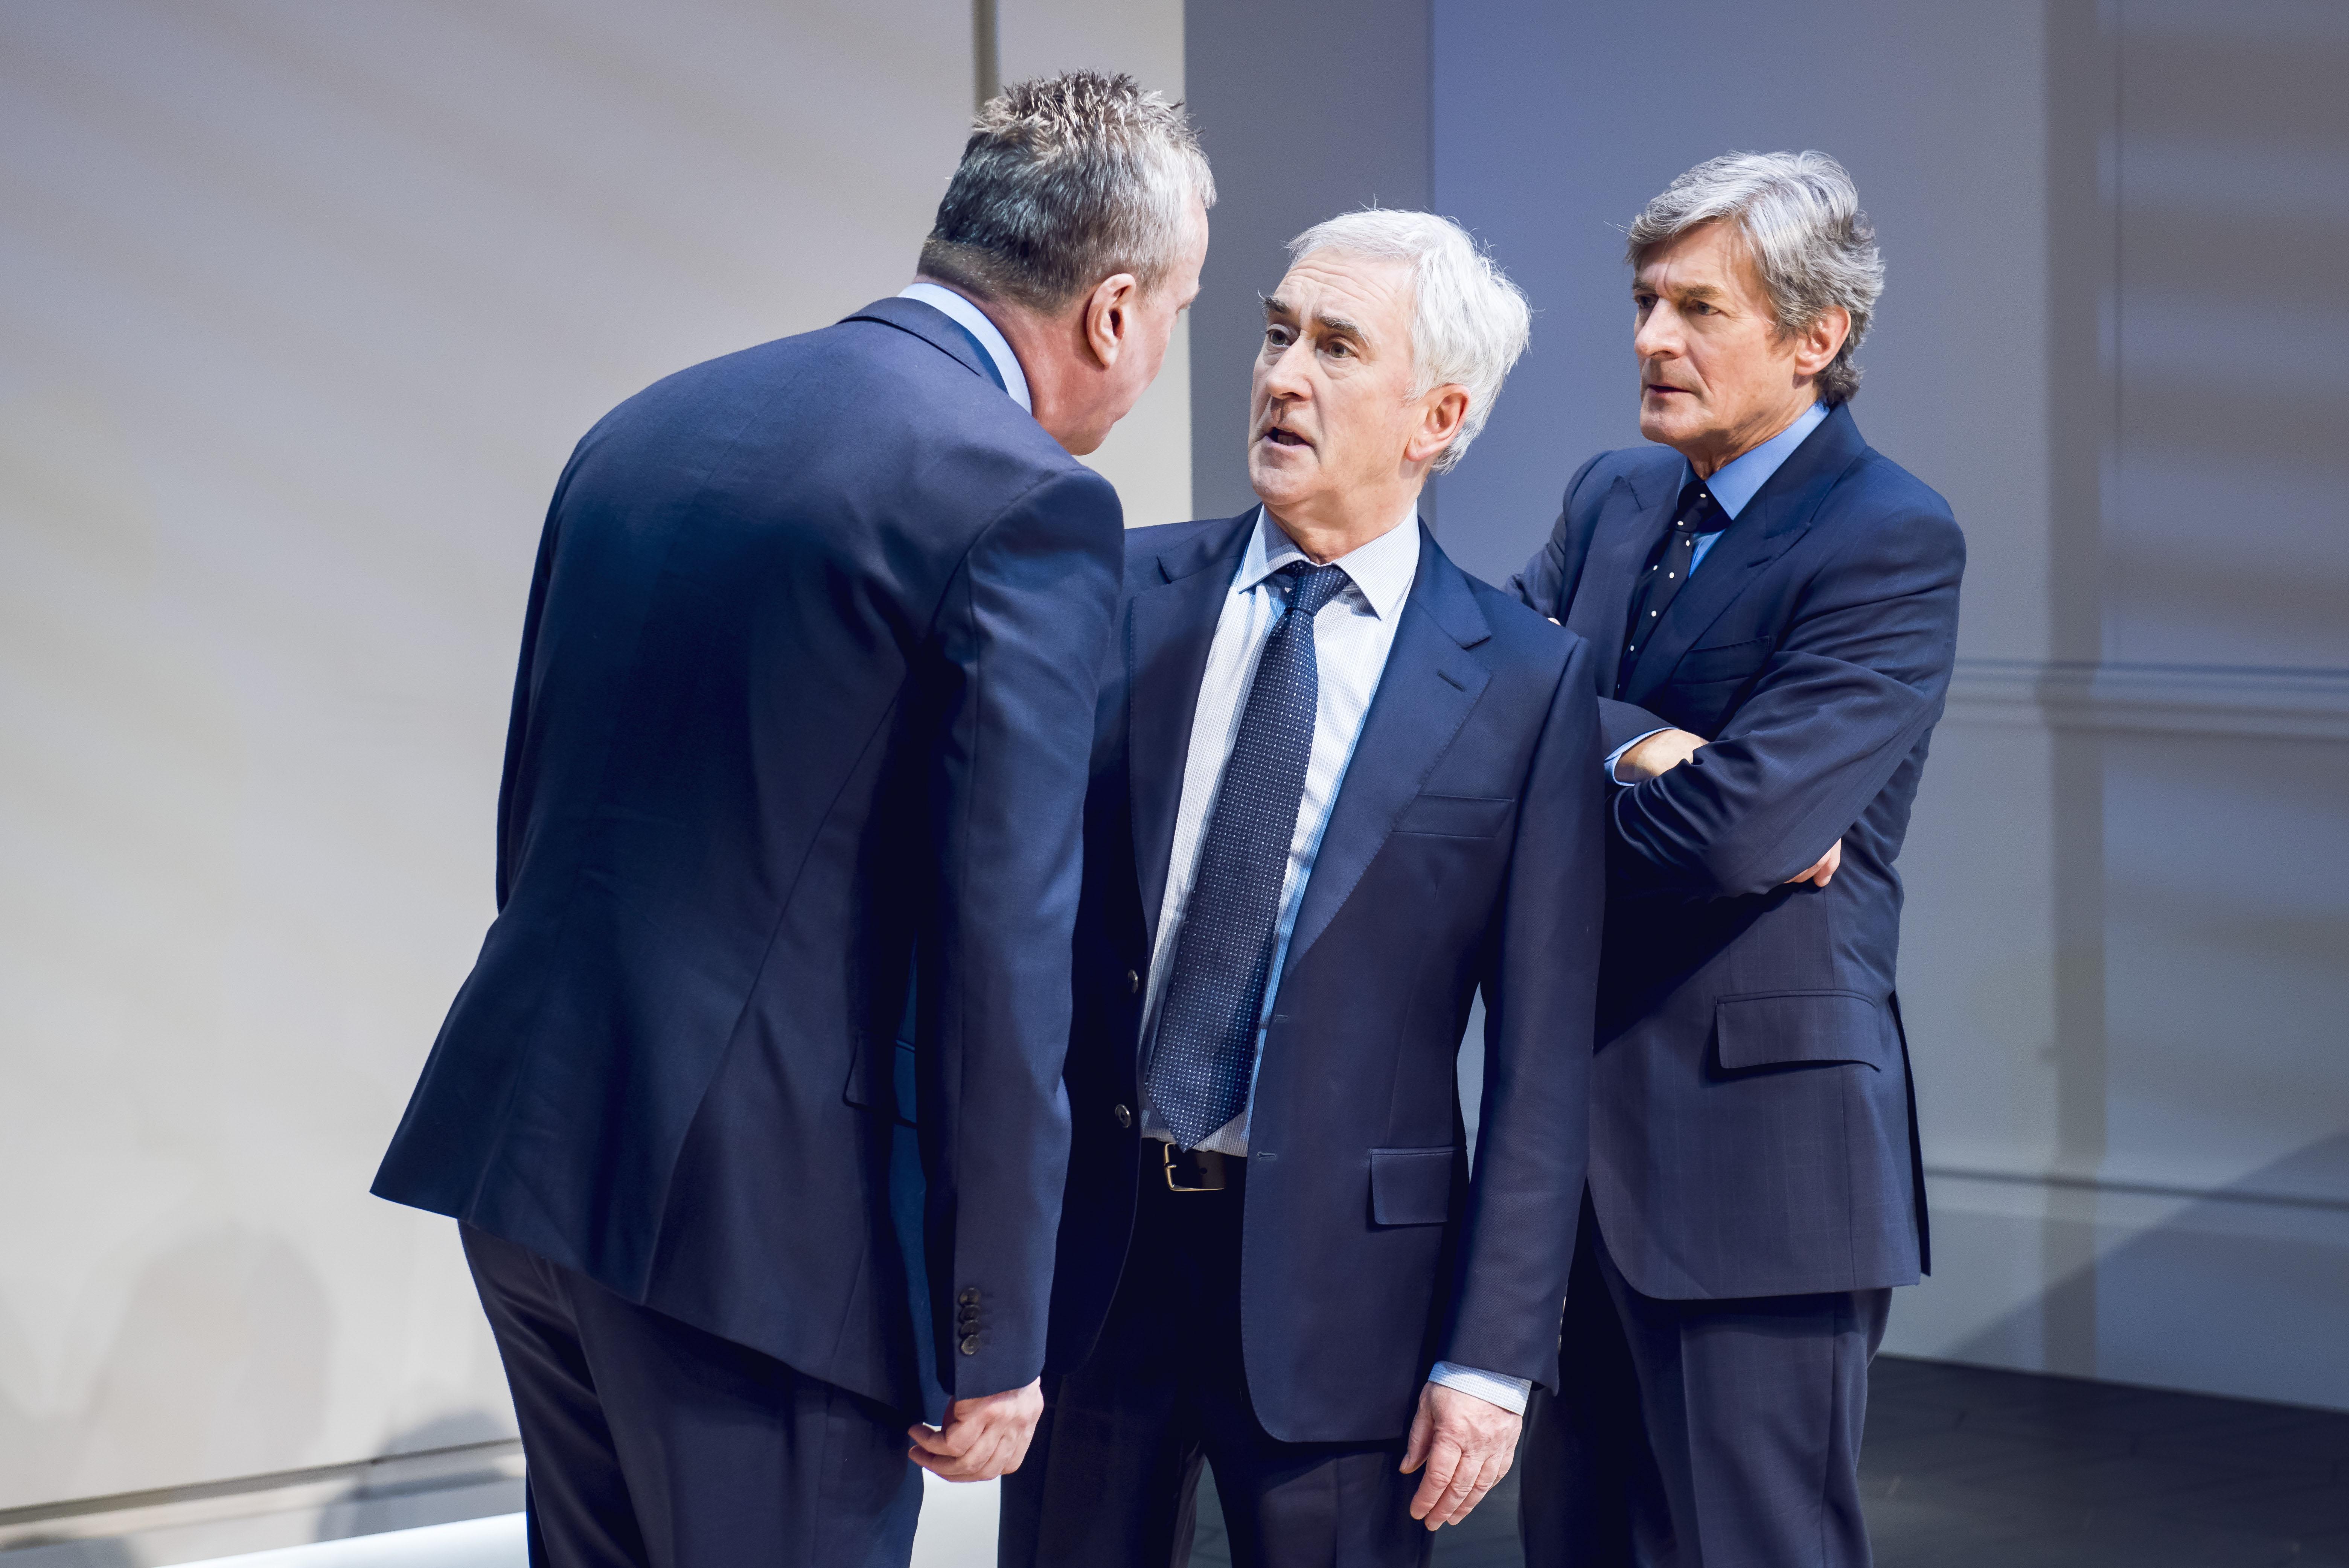 Stephen Tompkinson, Denis Lawson and Nigel Havers